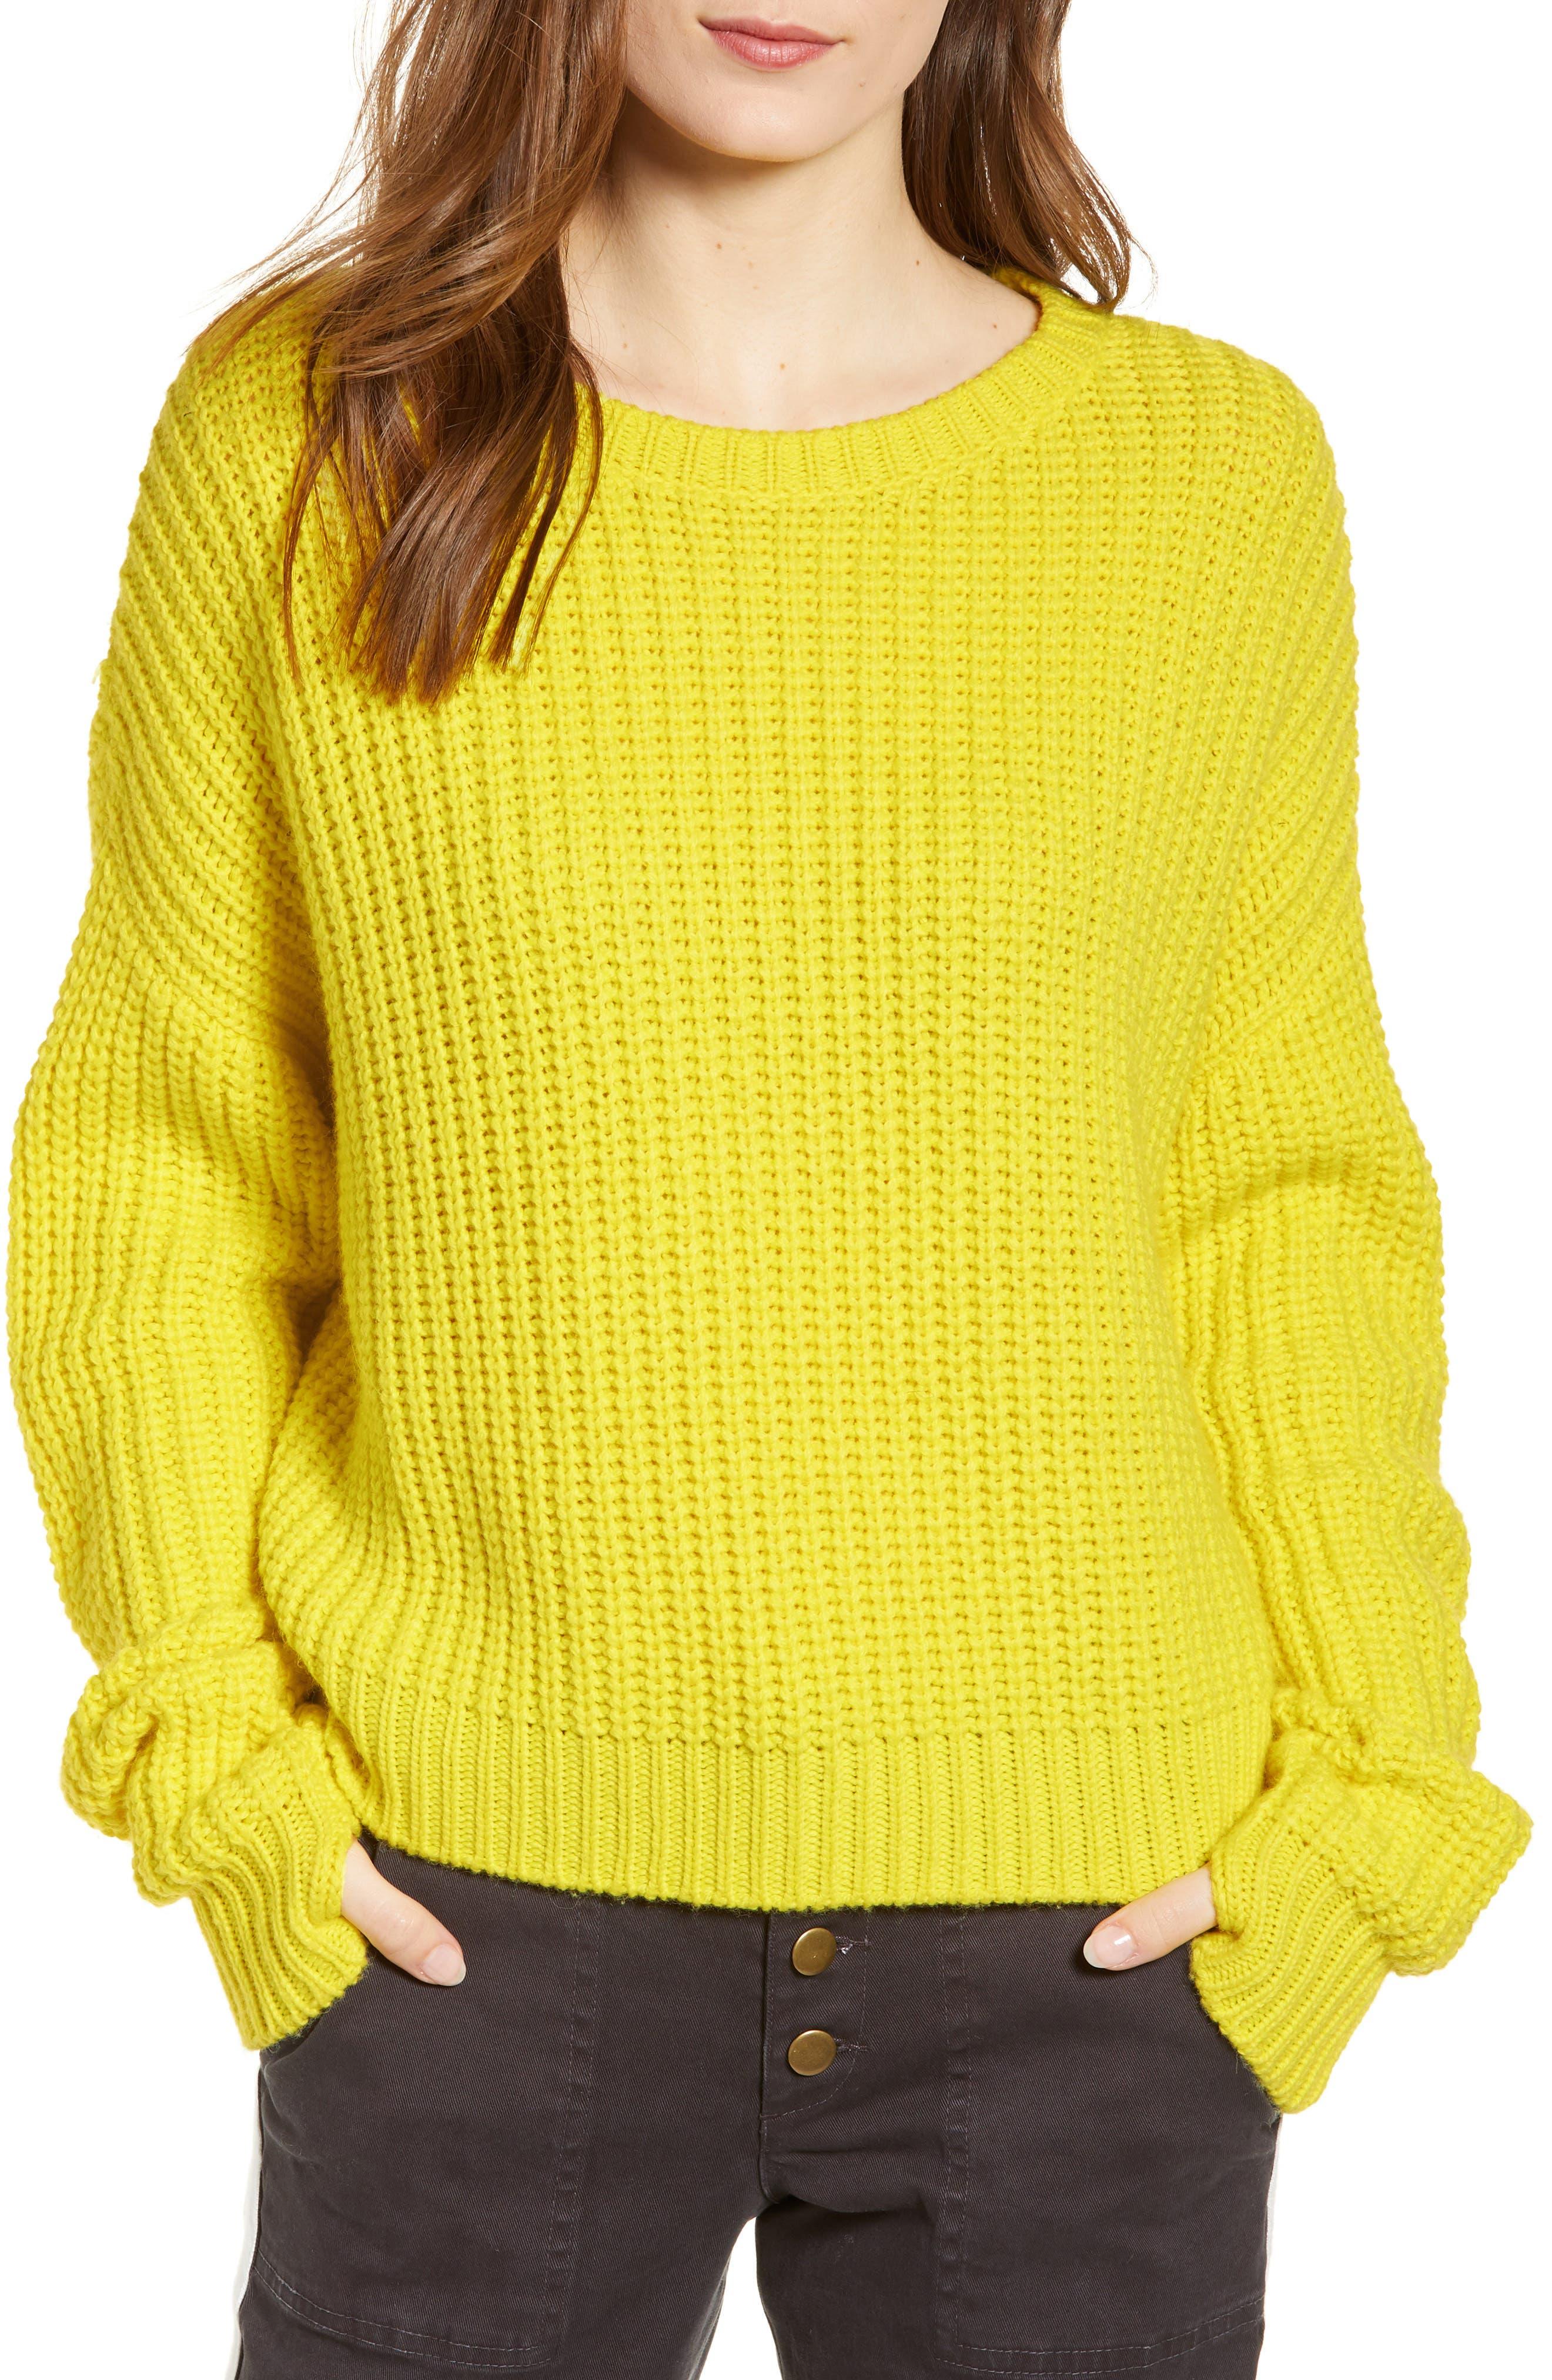 PAM & GELA, High/Low Sweater, Main thumbnail 1, color, 729